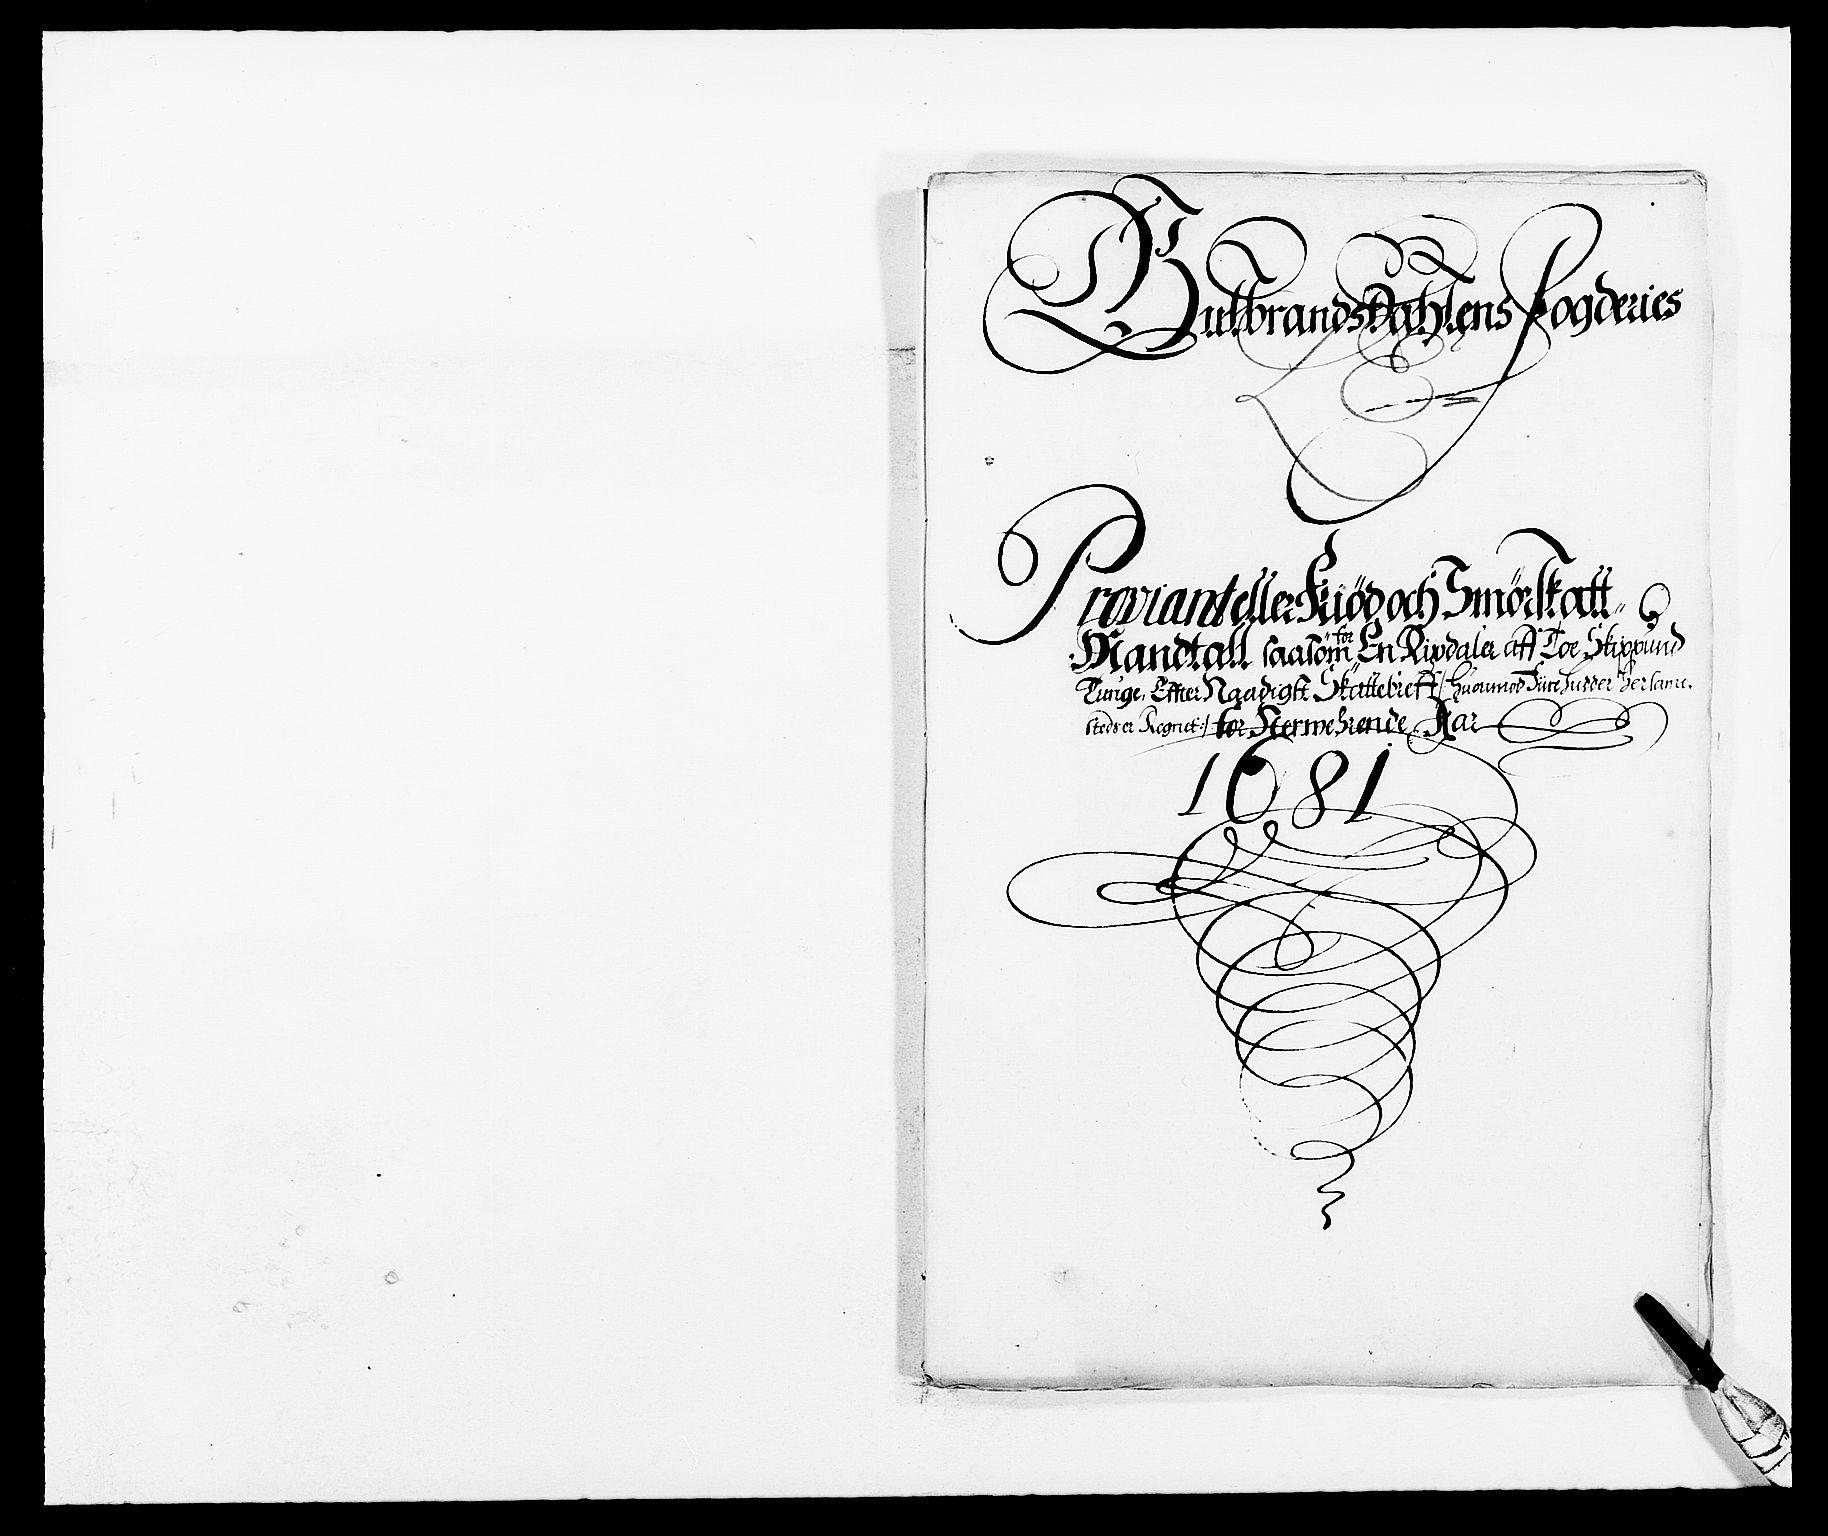 RA, Rentekammeret inntil 1814, Reviderte regnskaper, Fogderegnskap, R17/L1156: Fogderegnskap Gudbrandsdal, 1681, s. 41